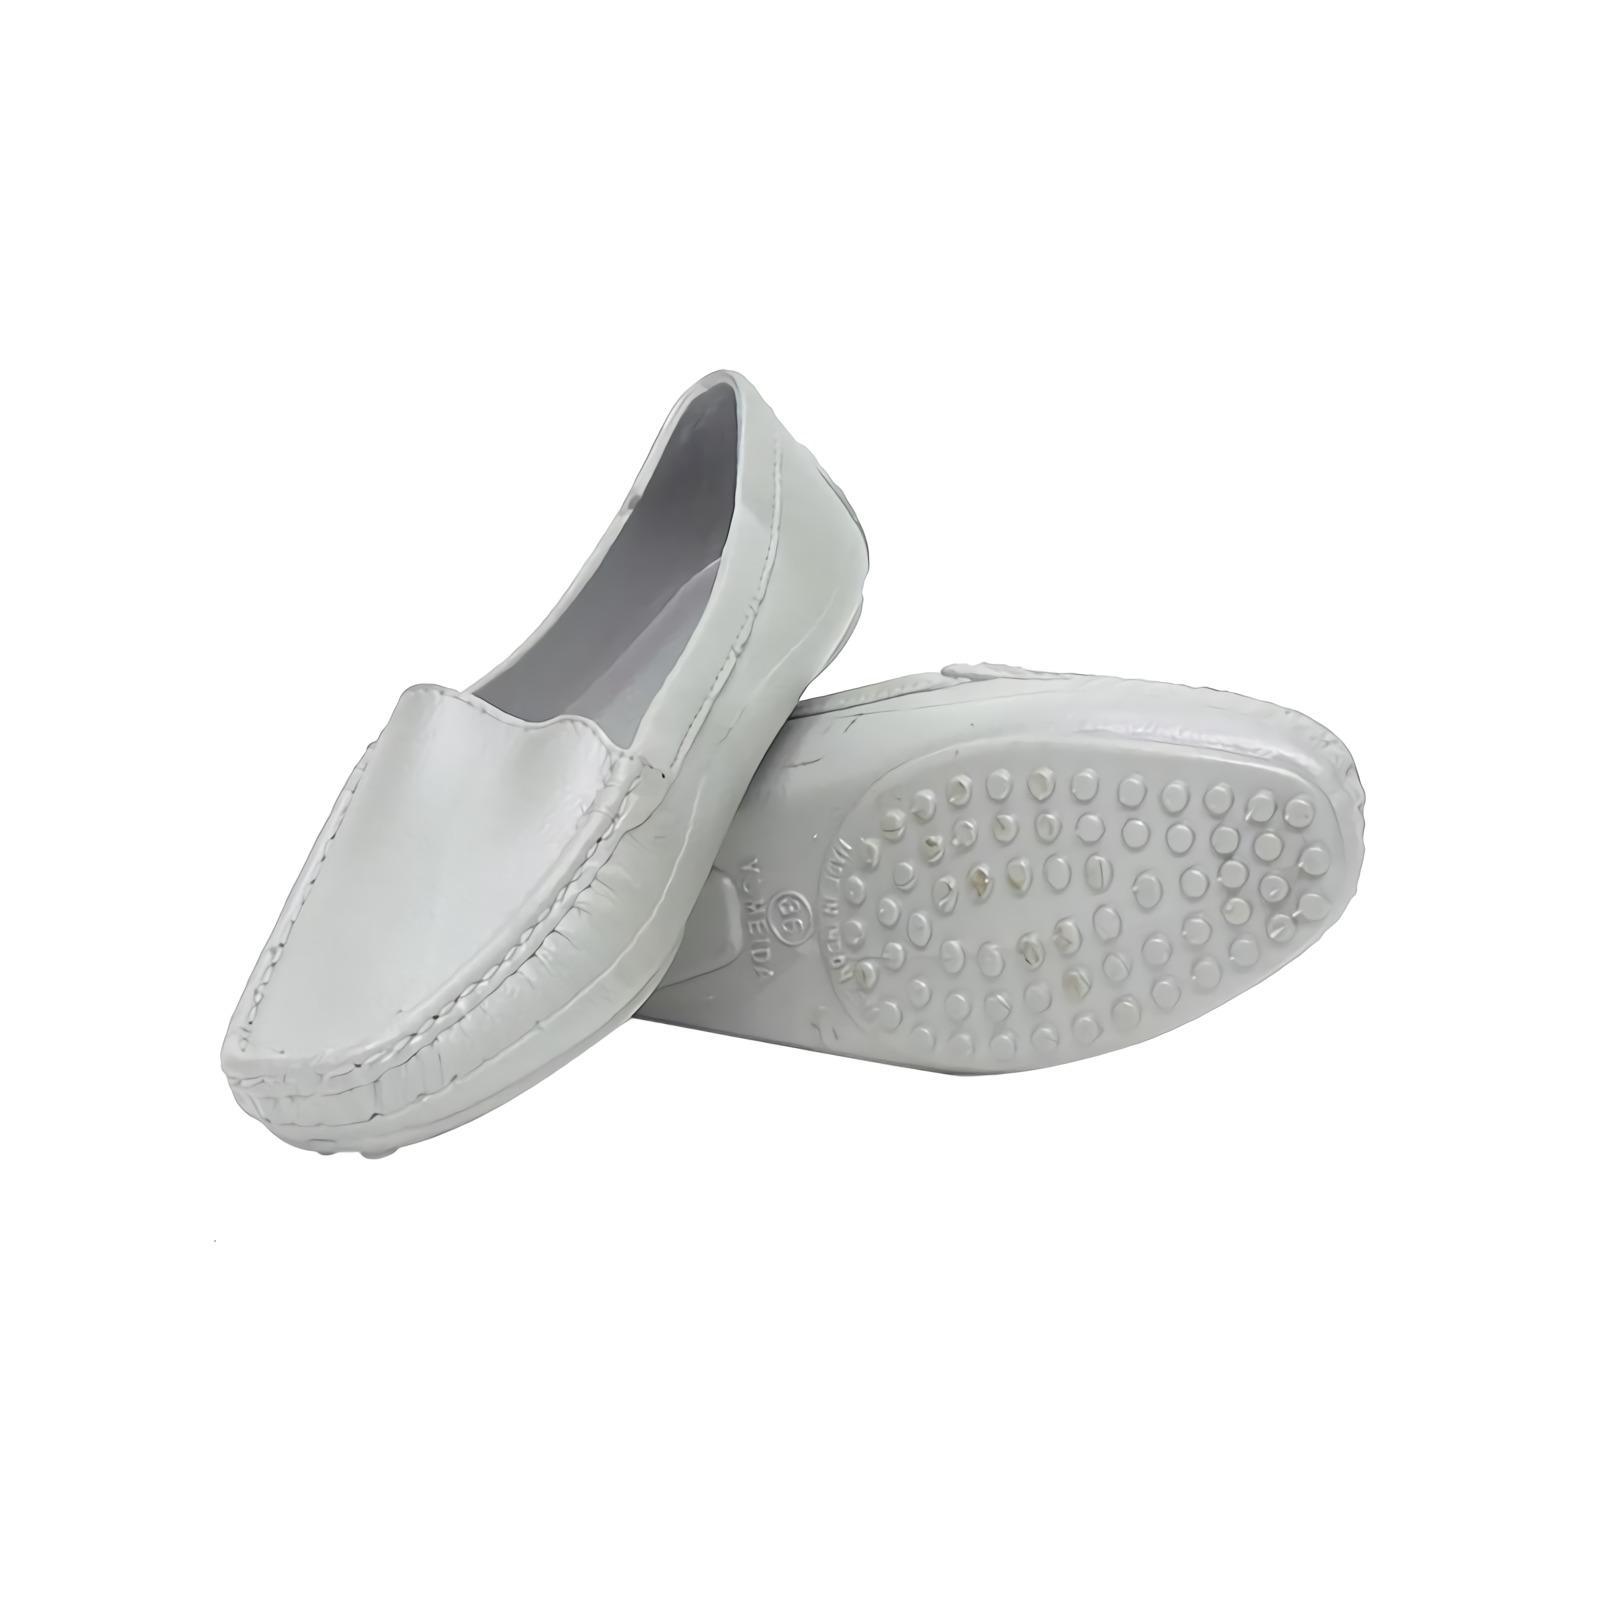 Cek Harga Baru Yumeida Sepatu Karet Jelly Wanita Ld5123 Flat Shoes Kerja Slip On 36 41 Re F085 Woman